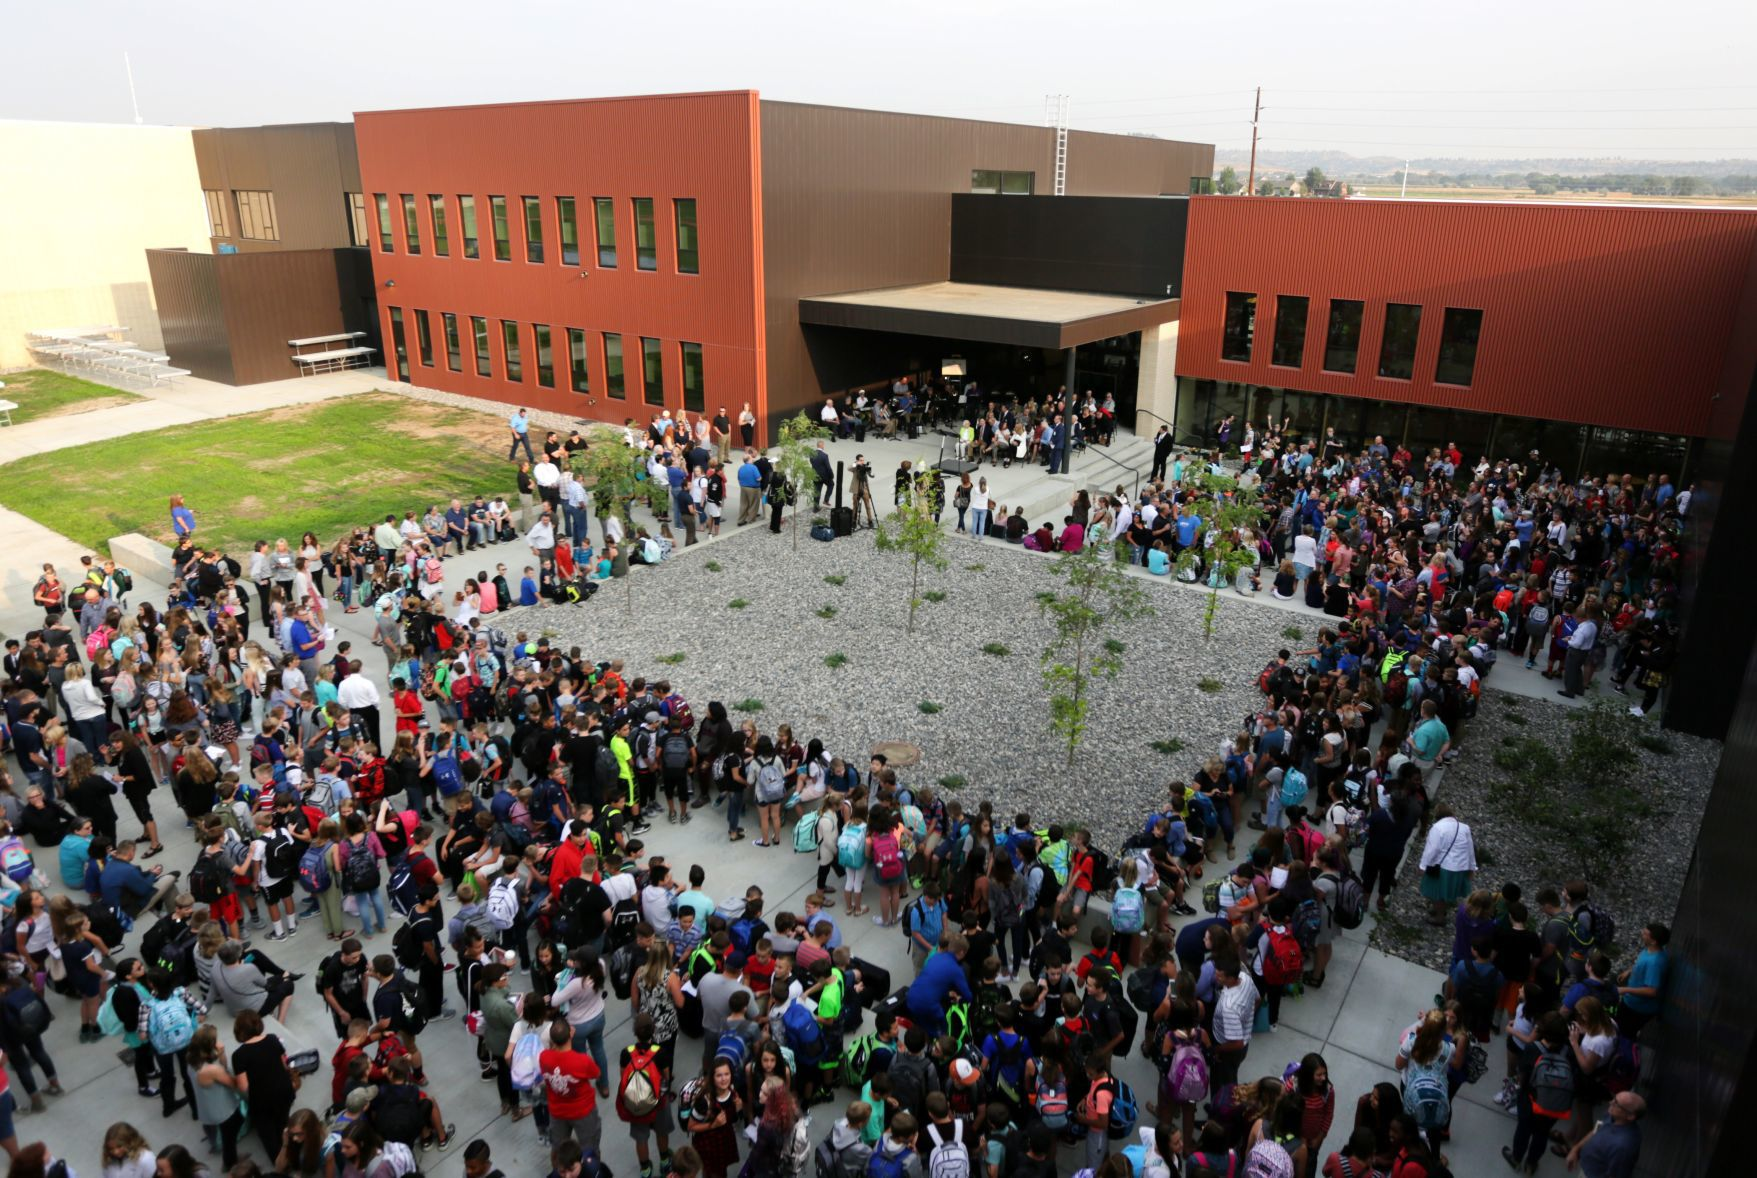 More students enrolled in Billings schools than expected | Billings Gazette